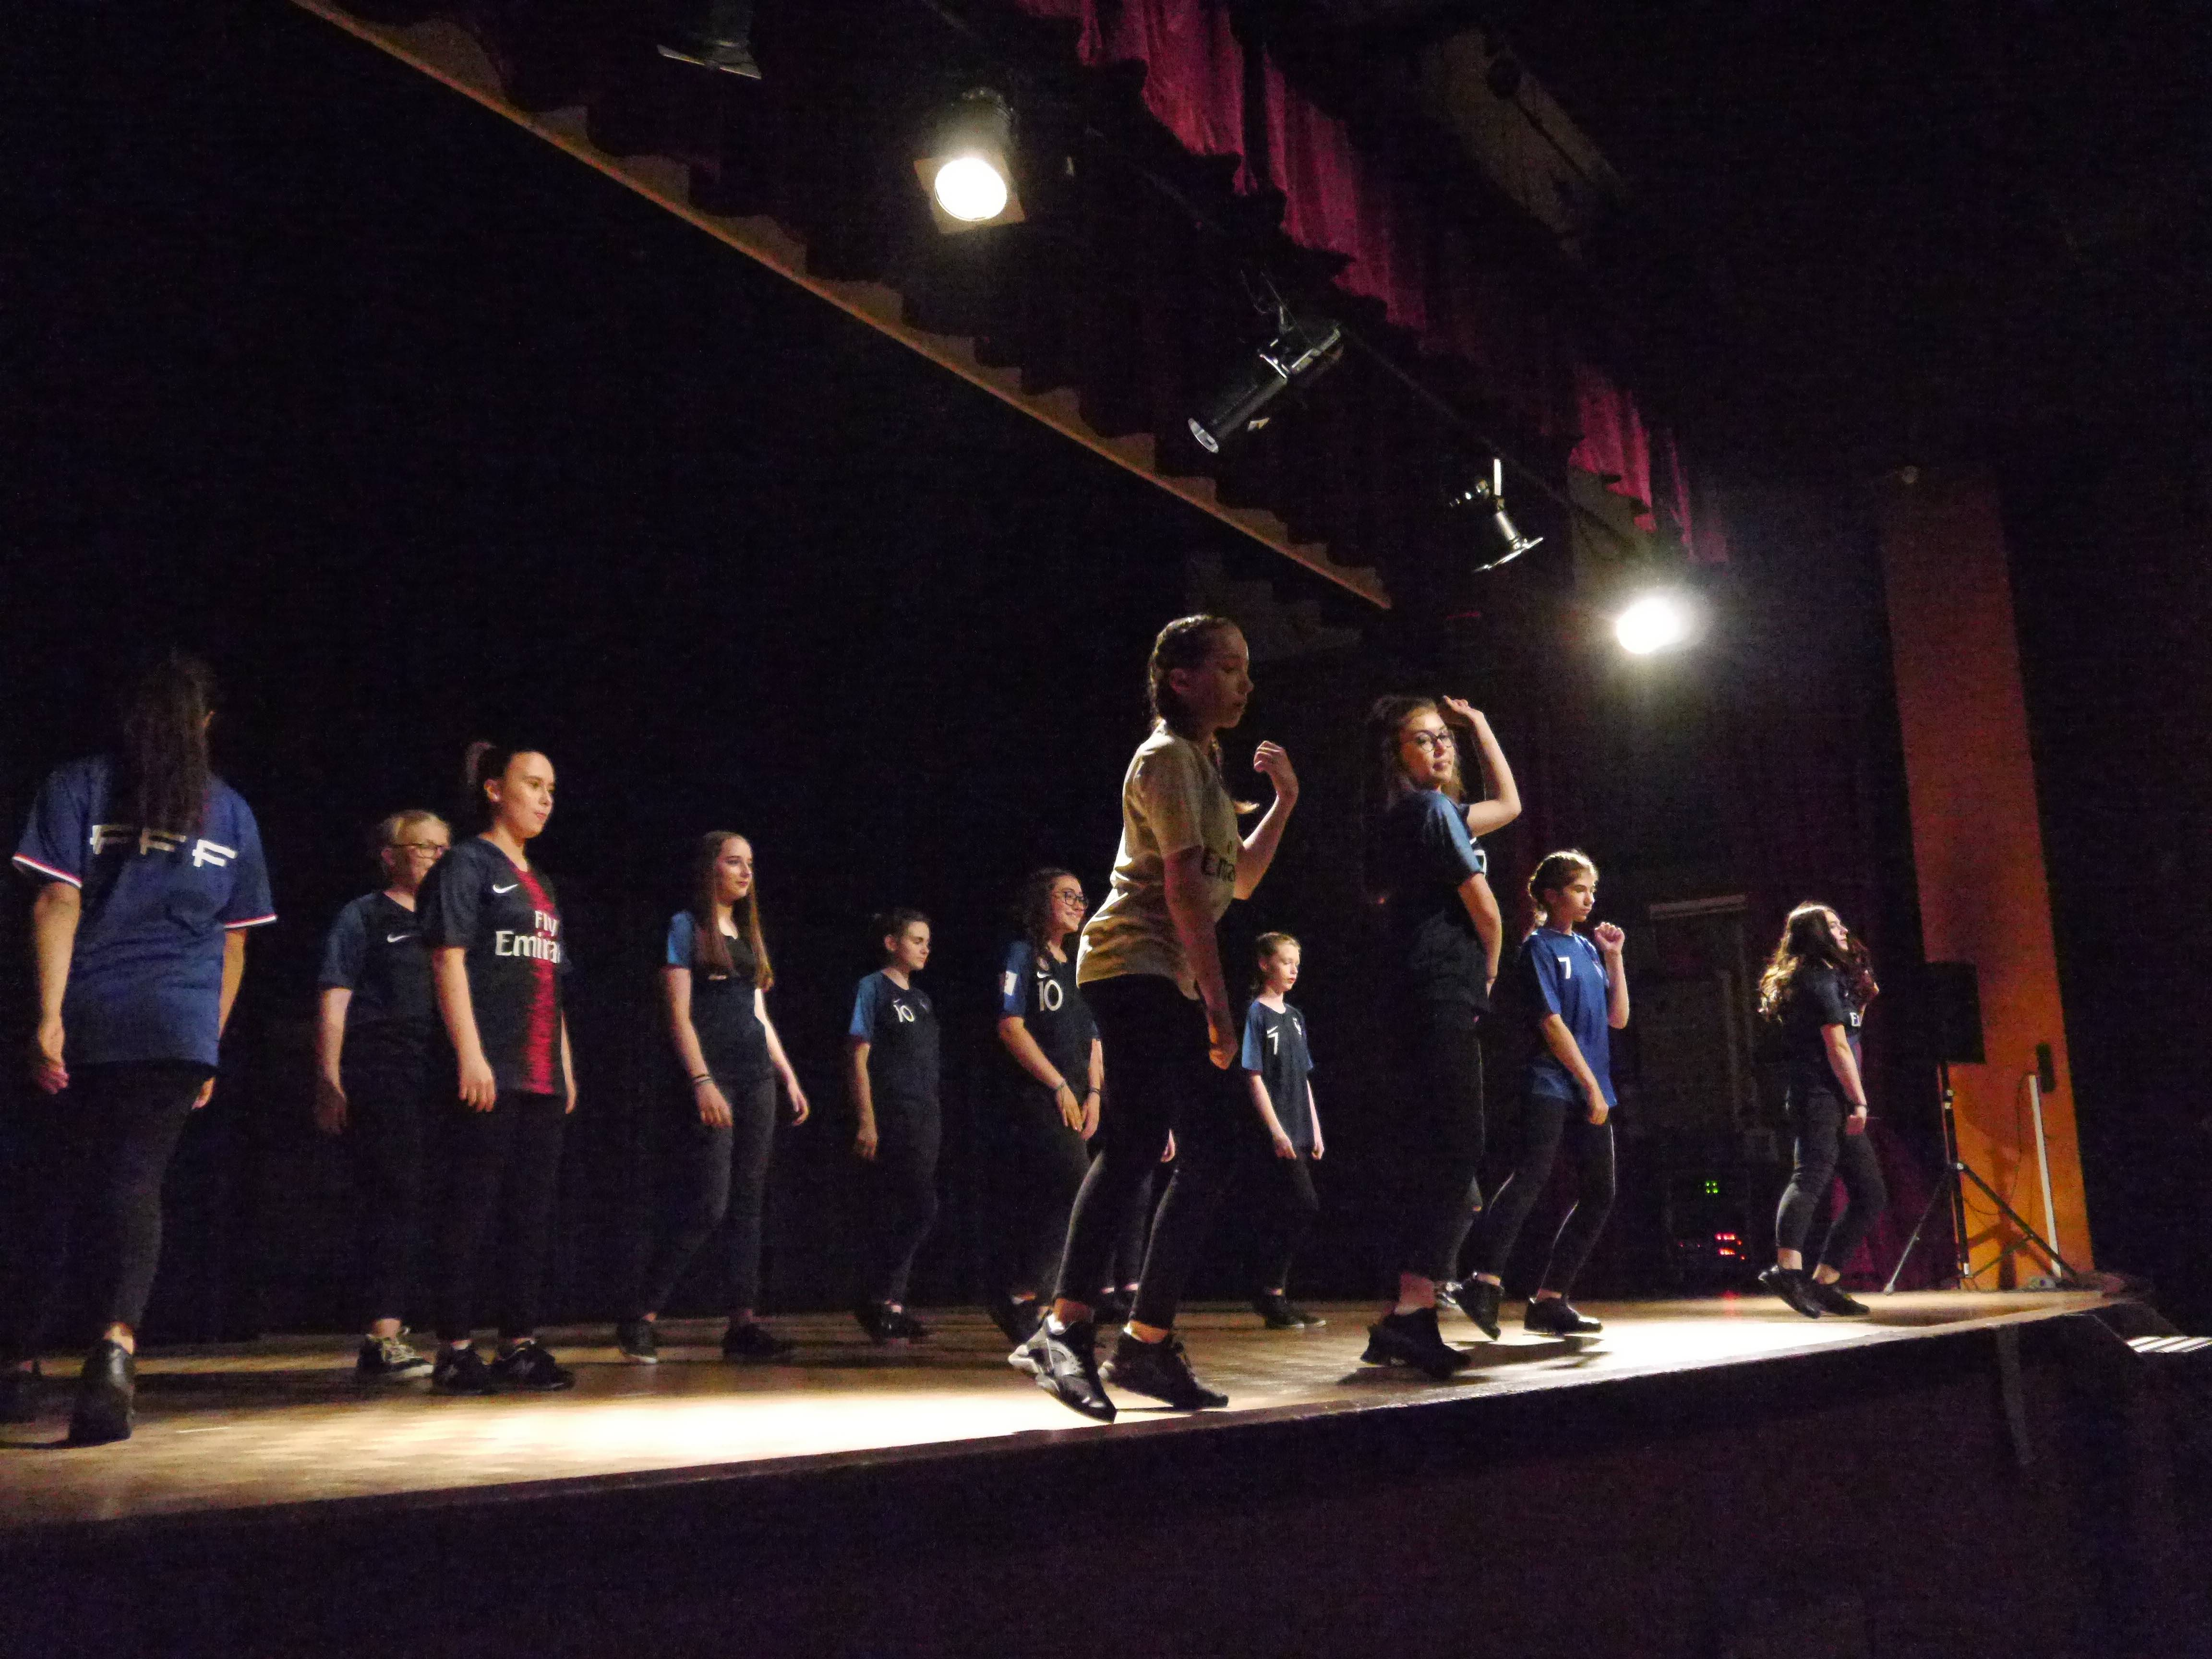 gala-danse-rythmique-fli-pompey 6 (7)